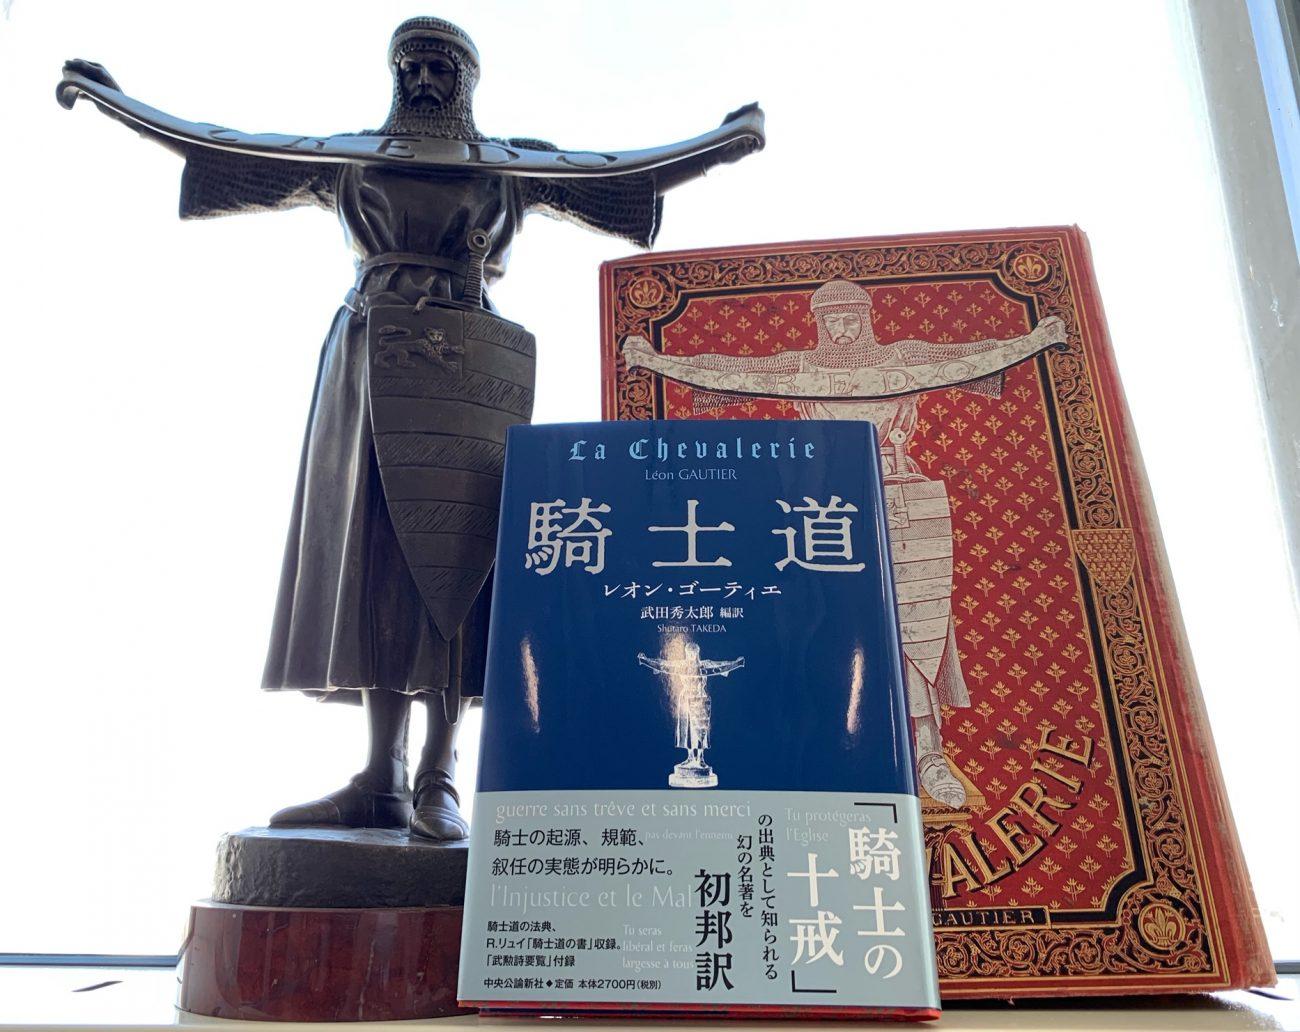 (Book) Chivalry / Leon Gautier, Shutaro Takeda (Ed.)